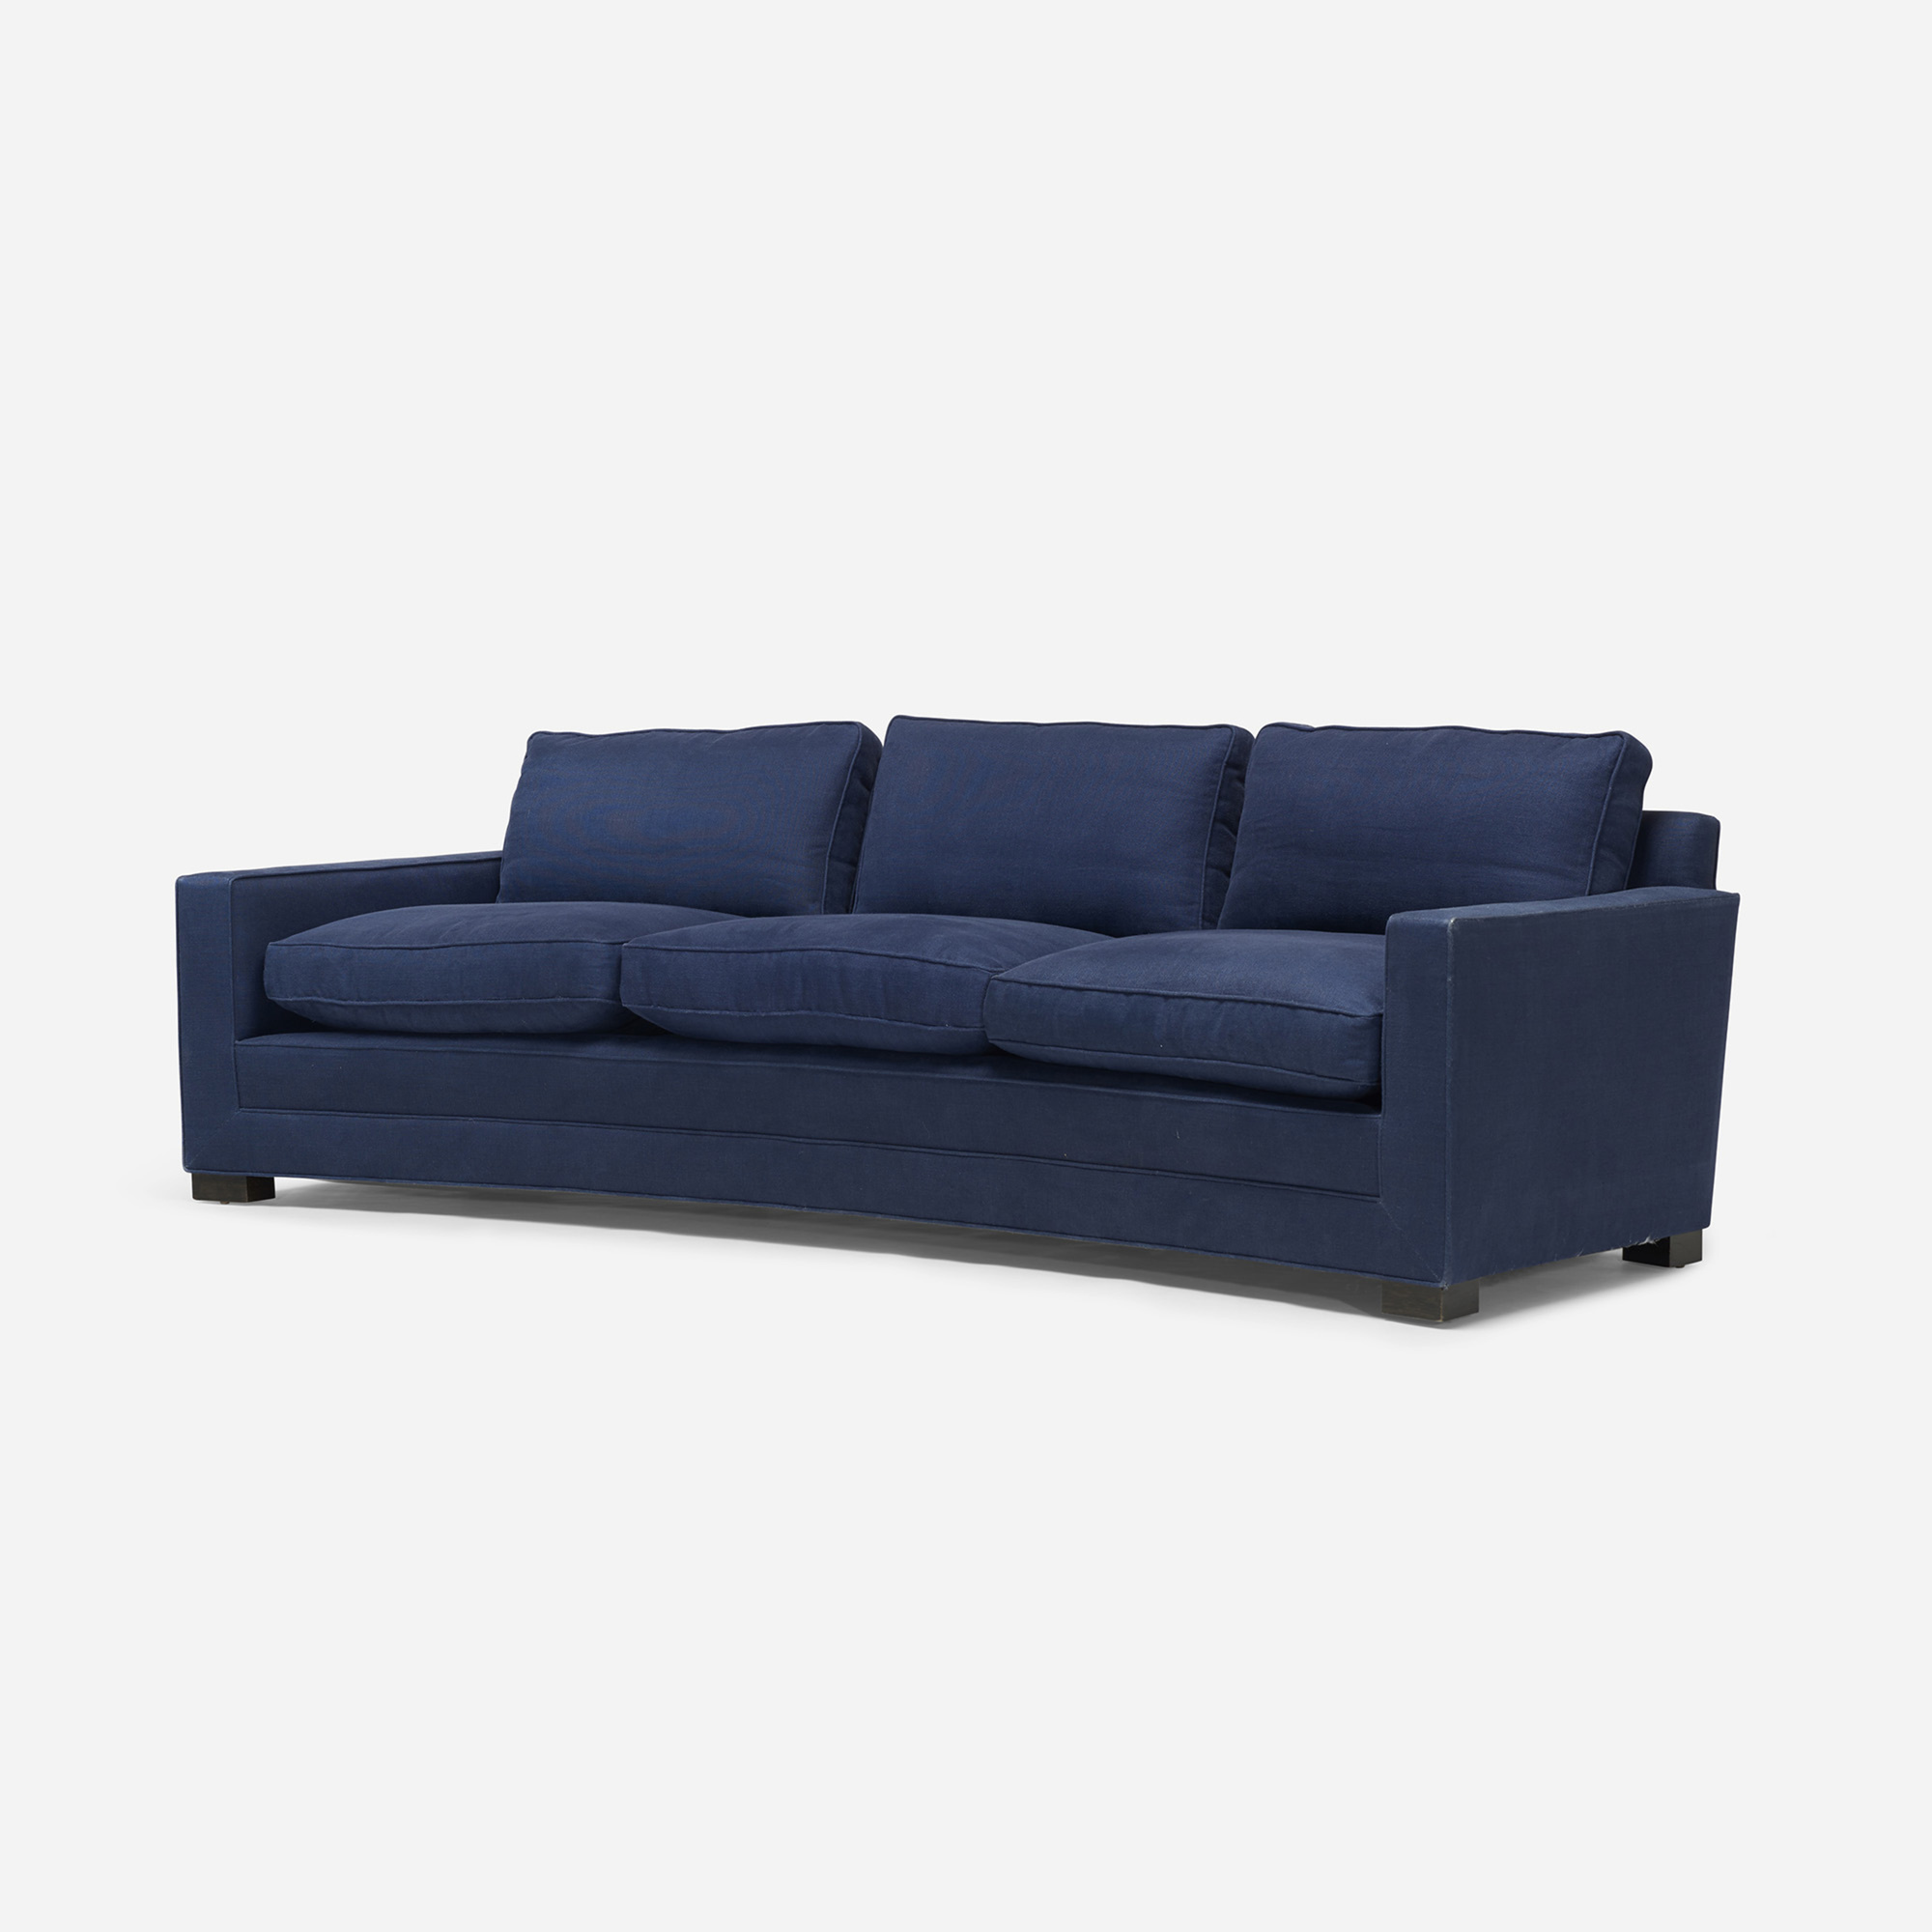 577: Modern / sofa (1 of 3)